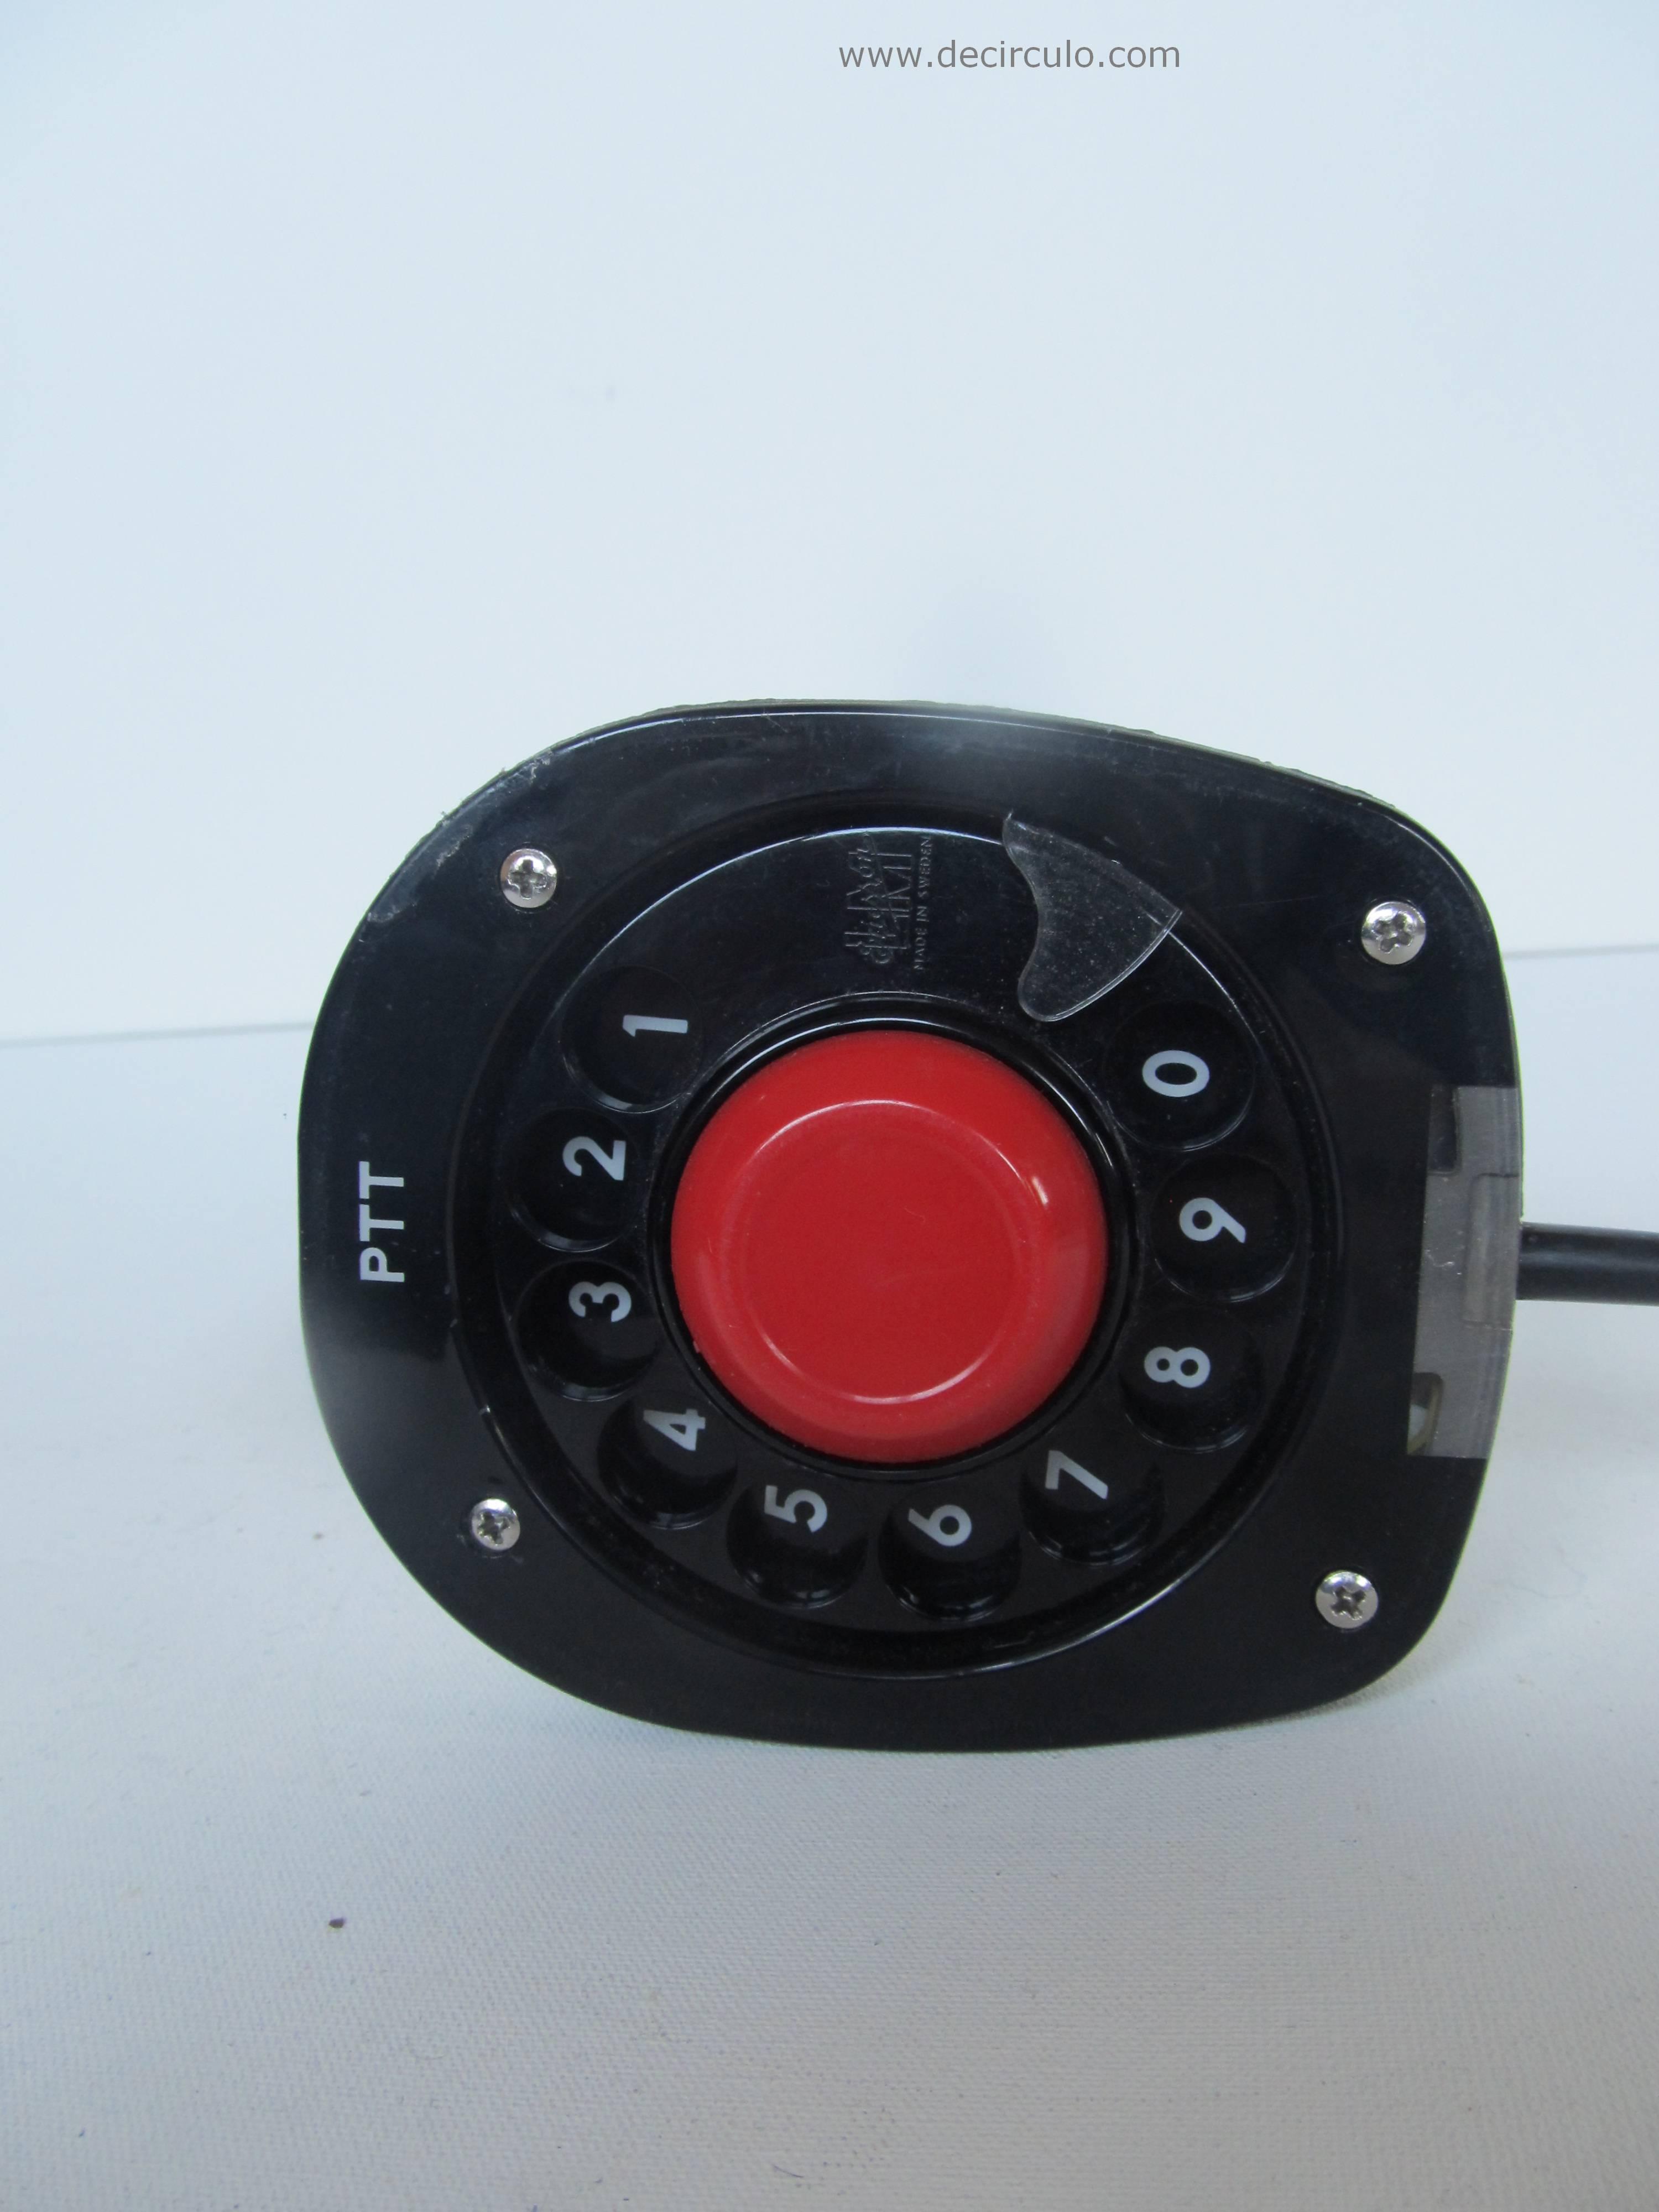 White Ericofon Sony Ericsson Telephone Vintage